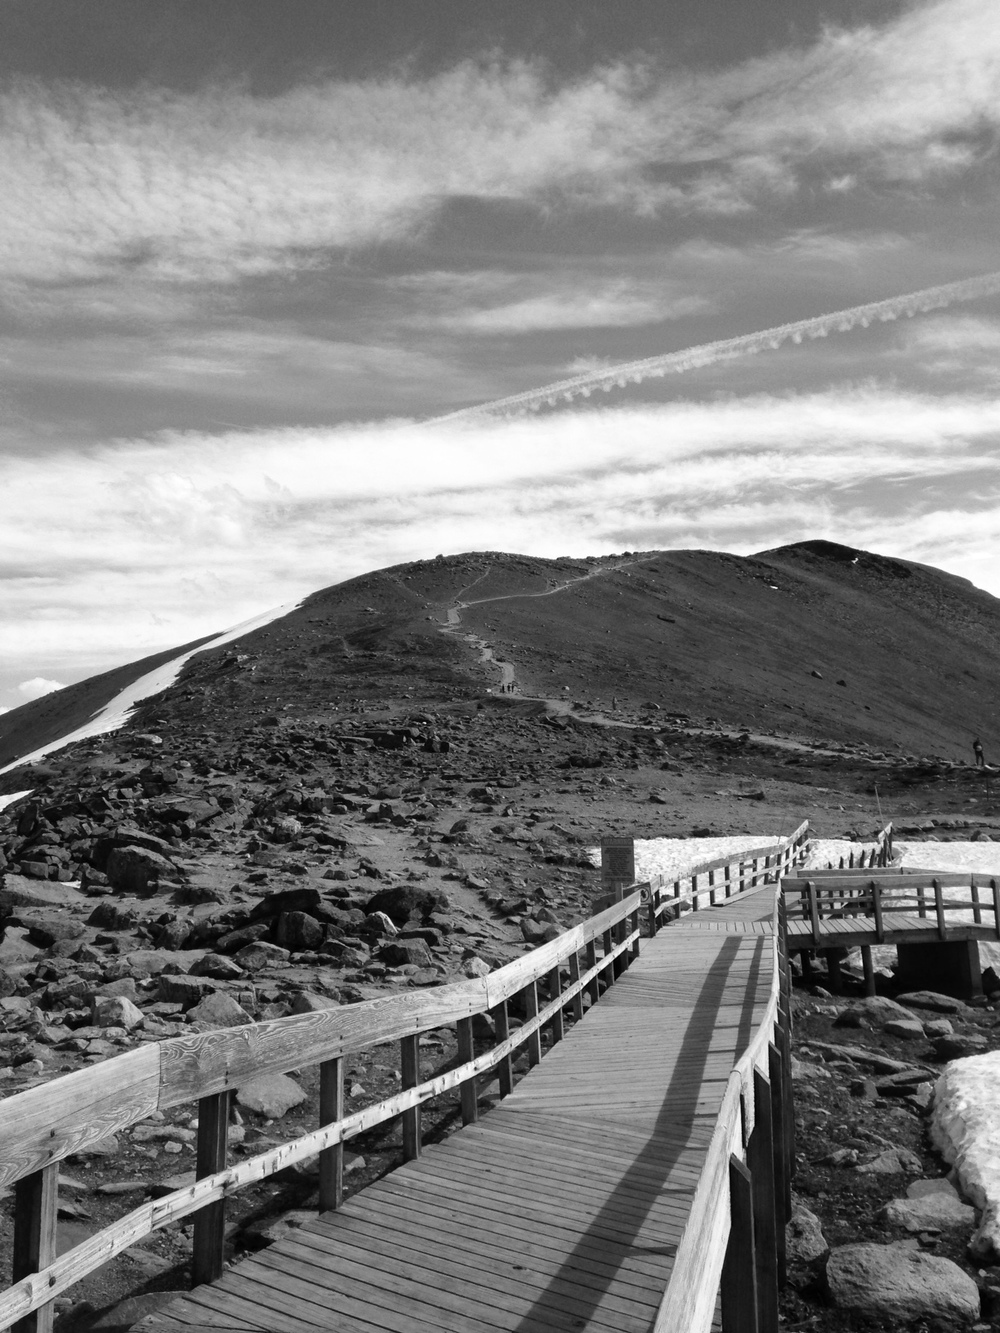 Summit of Whistlers Mountain